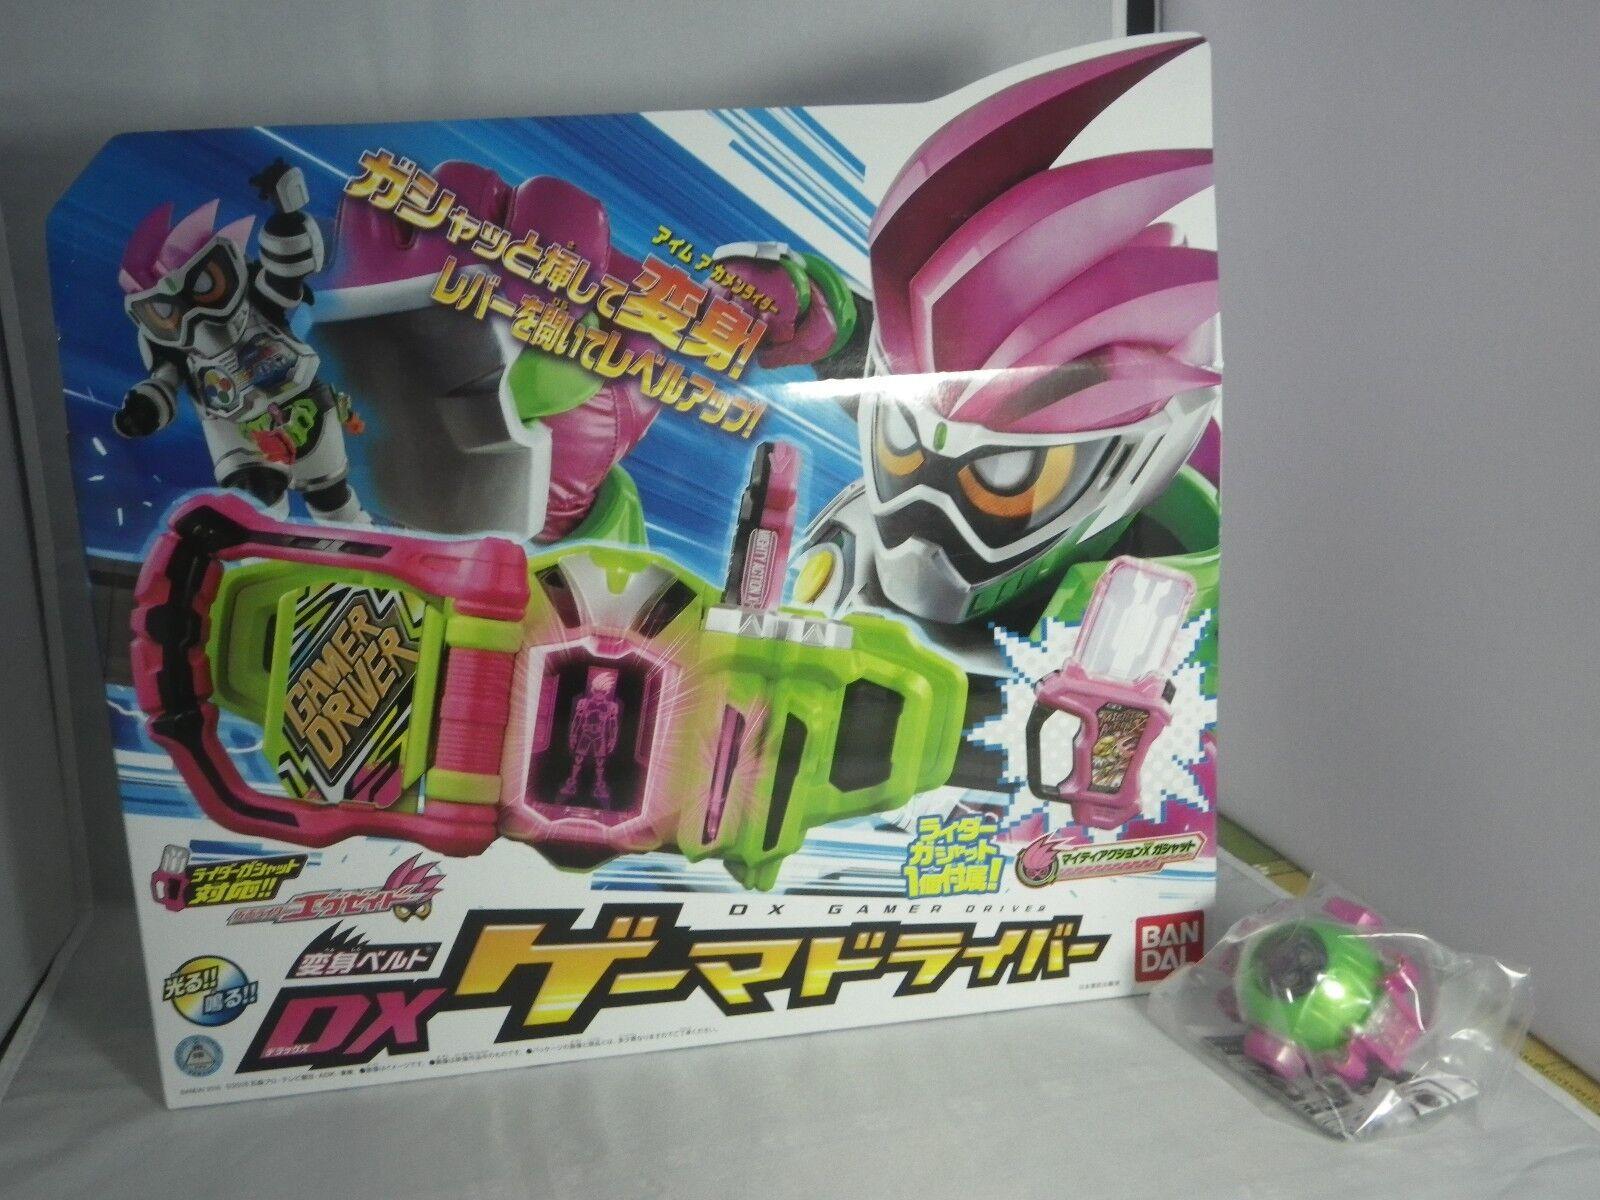 BANDAI enmascarado Kamen Rider Cinturón Dx Ex-Aid Prendedores Gamer controlador Japón fantasma icono